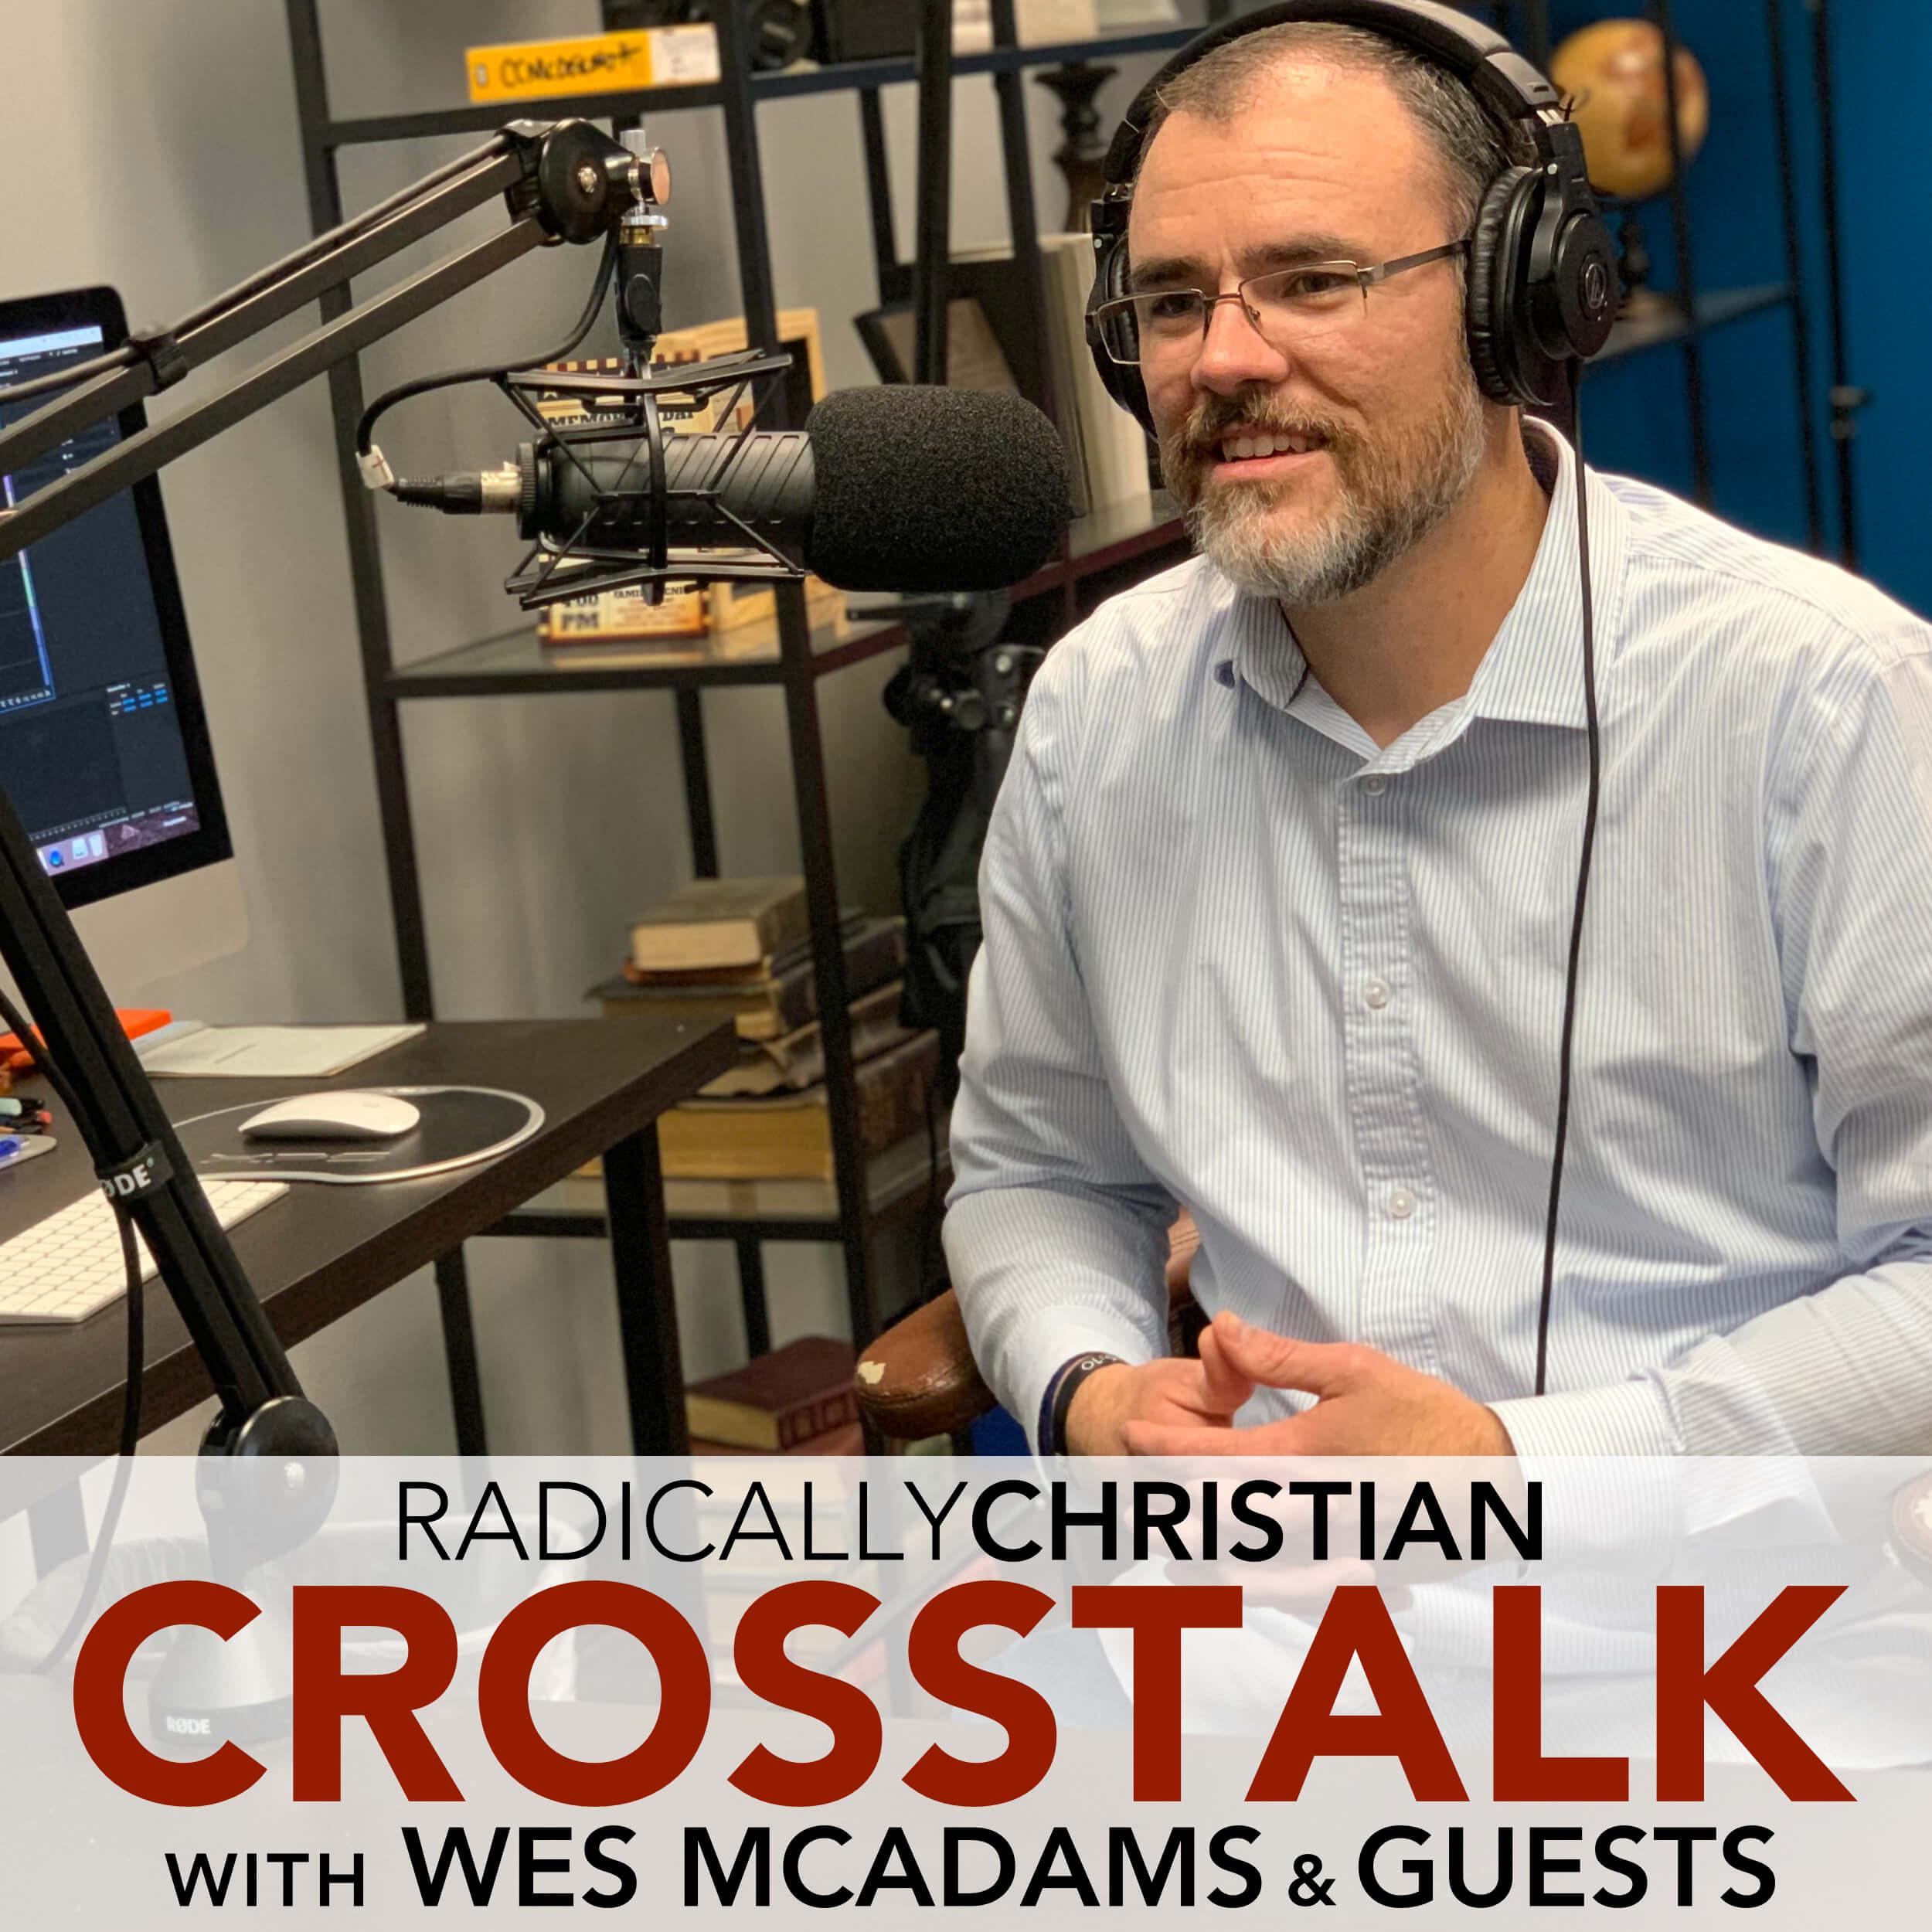 Radically Christian CrossTalk Podcast